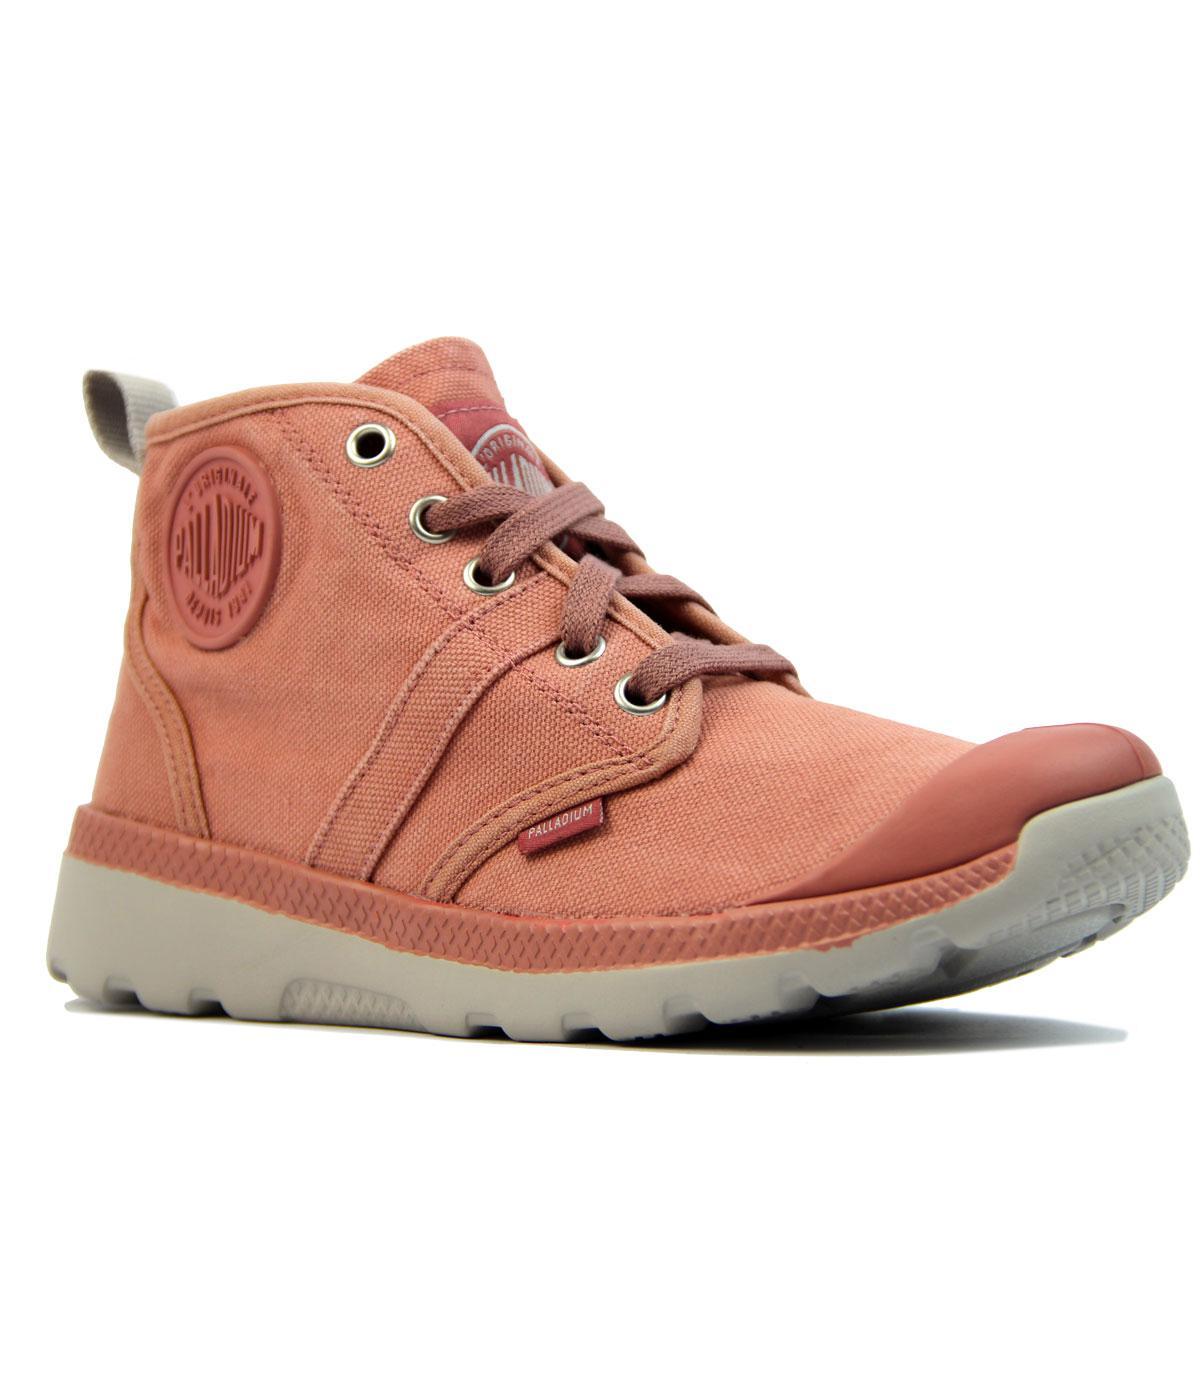 Pallaville Hi PALLADIUM Retro Indie Womens Boots R